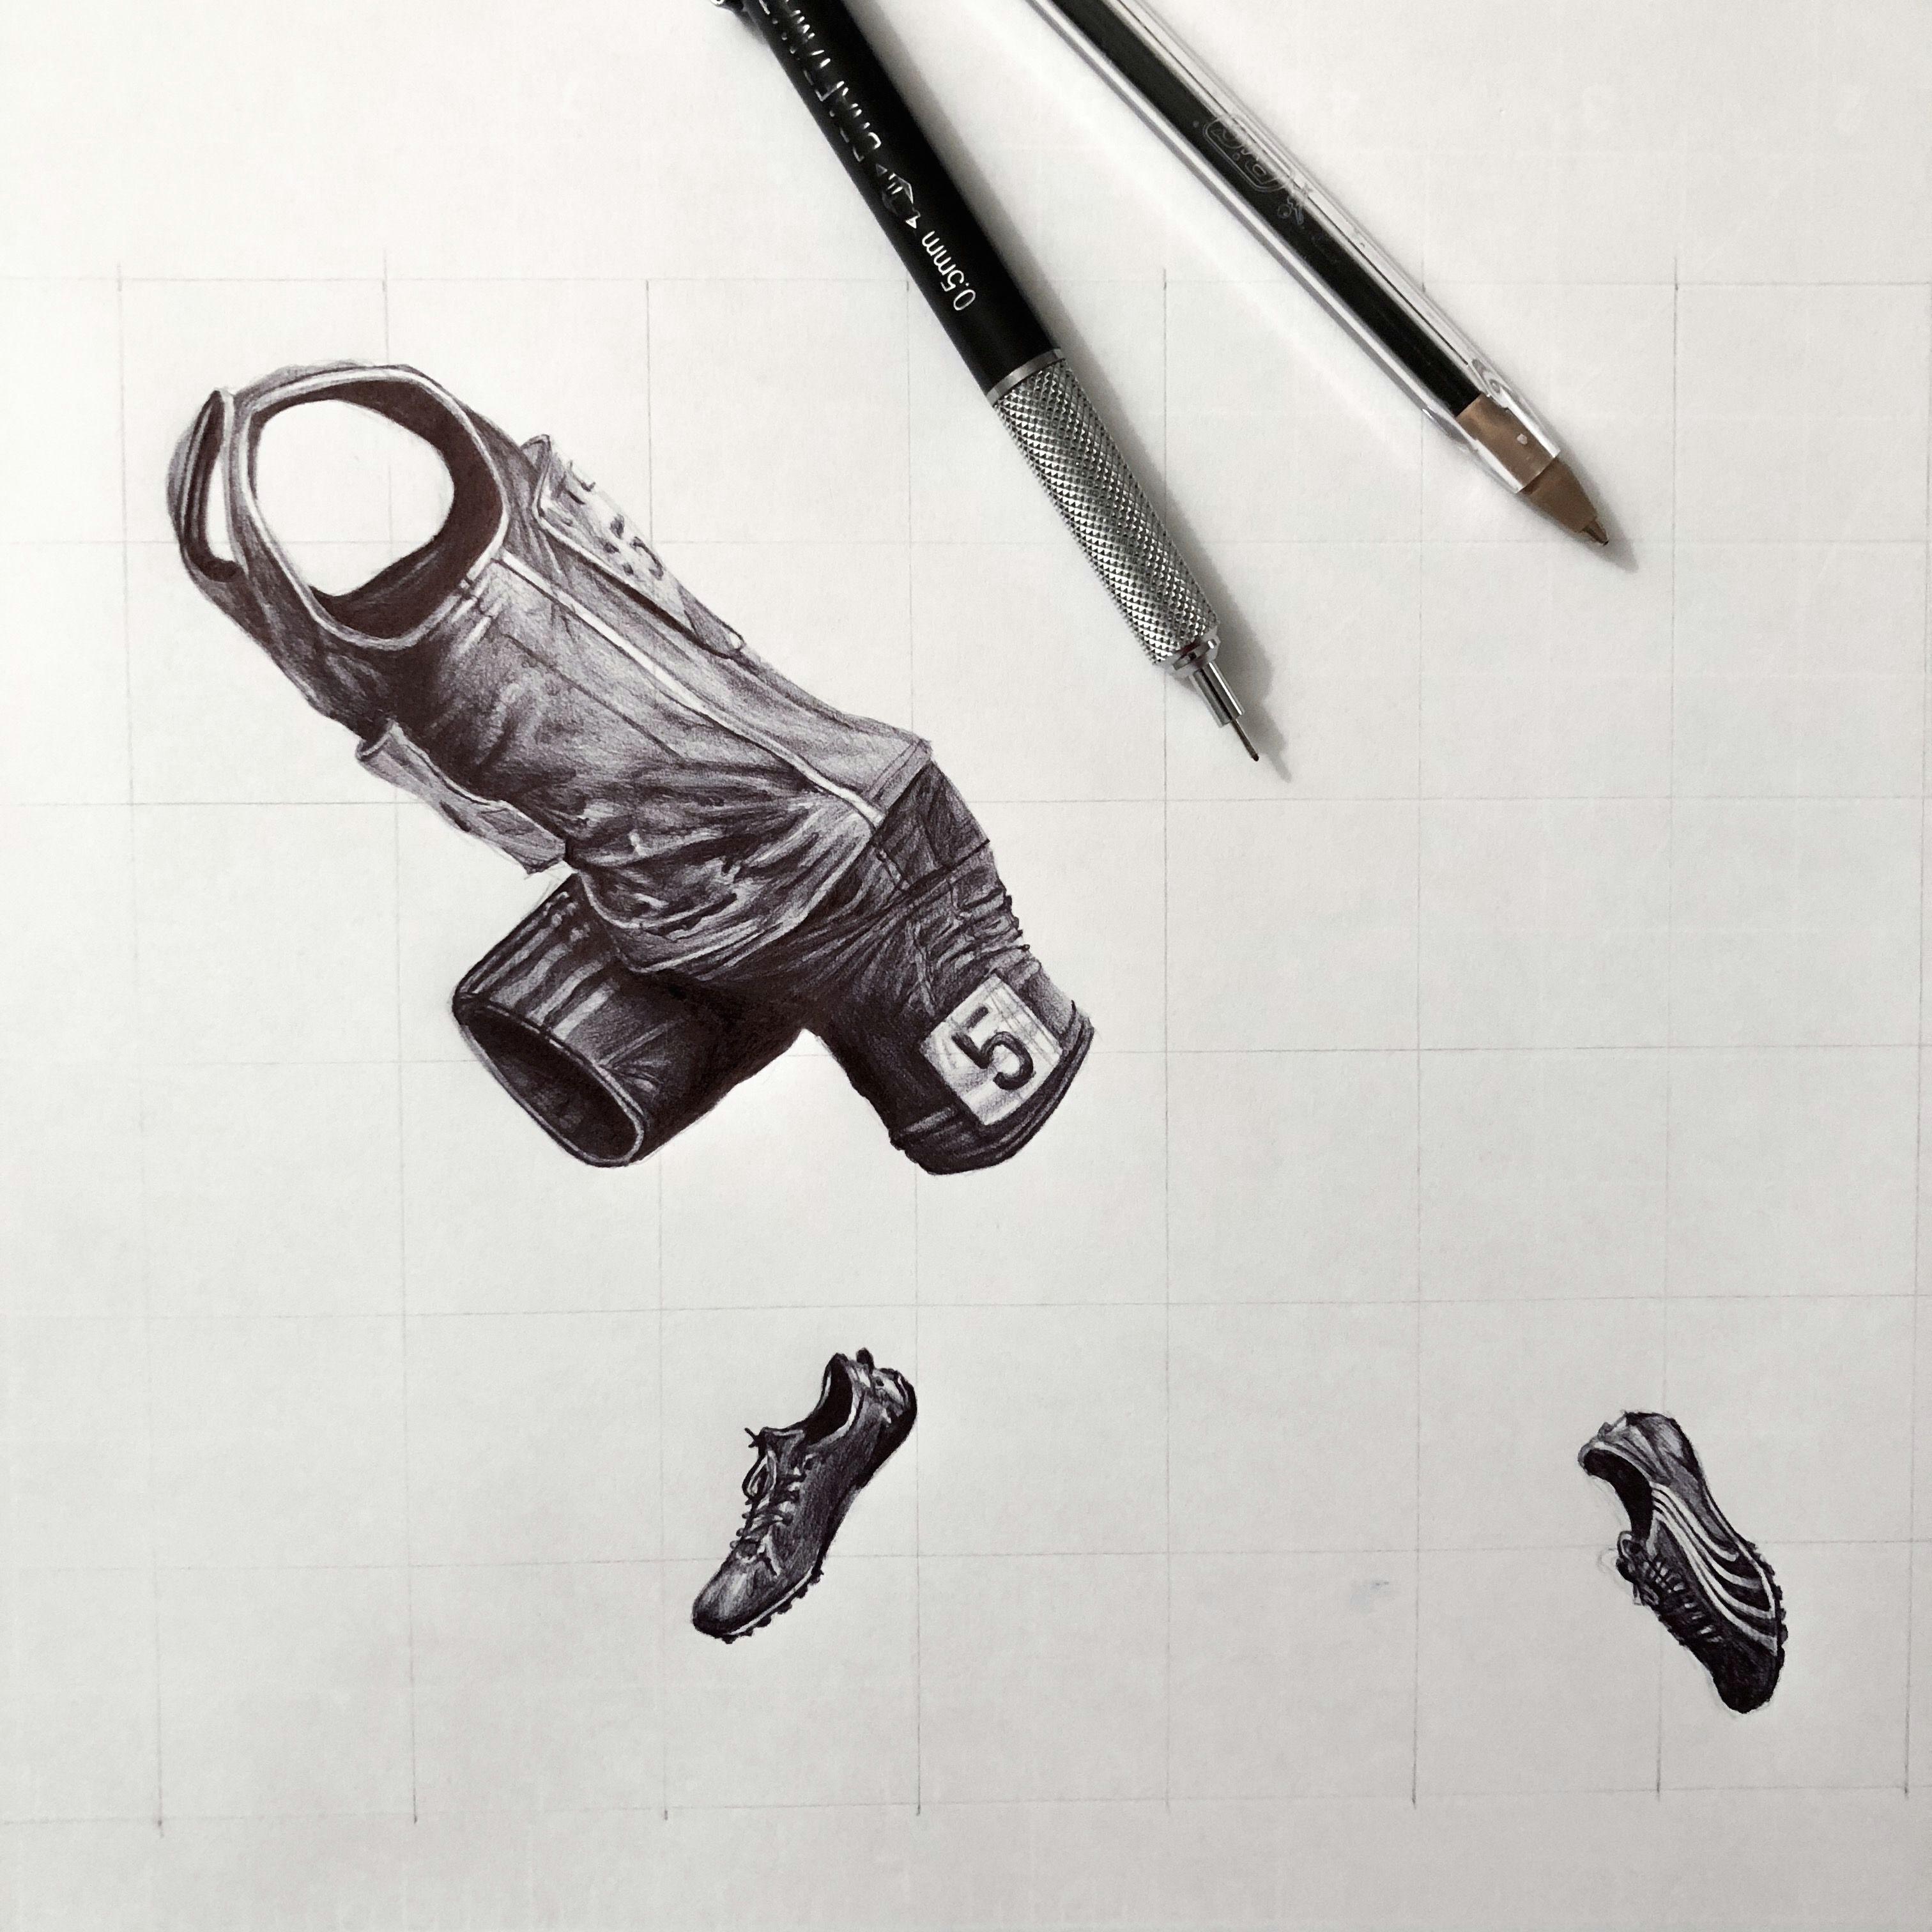 usain bolt track and field joey khamis design pen drawing canvas prints canvas ideas wall art running